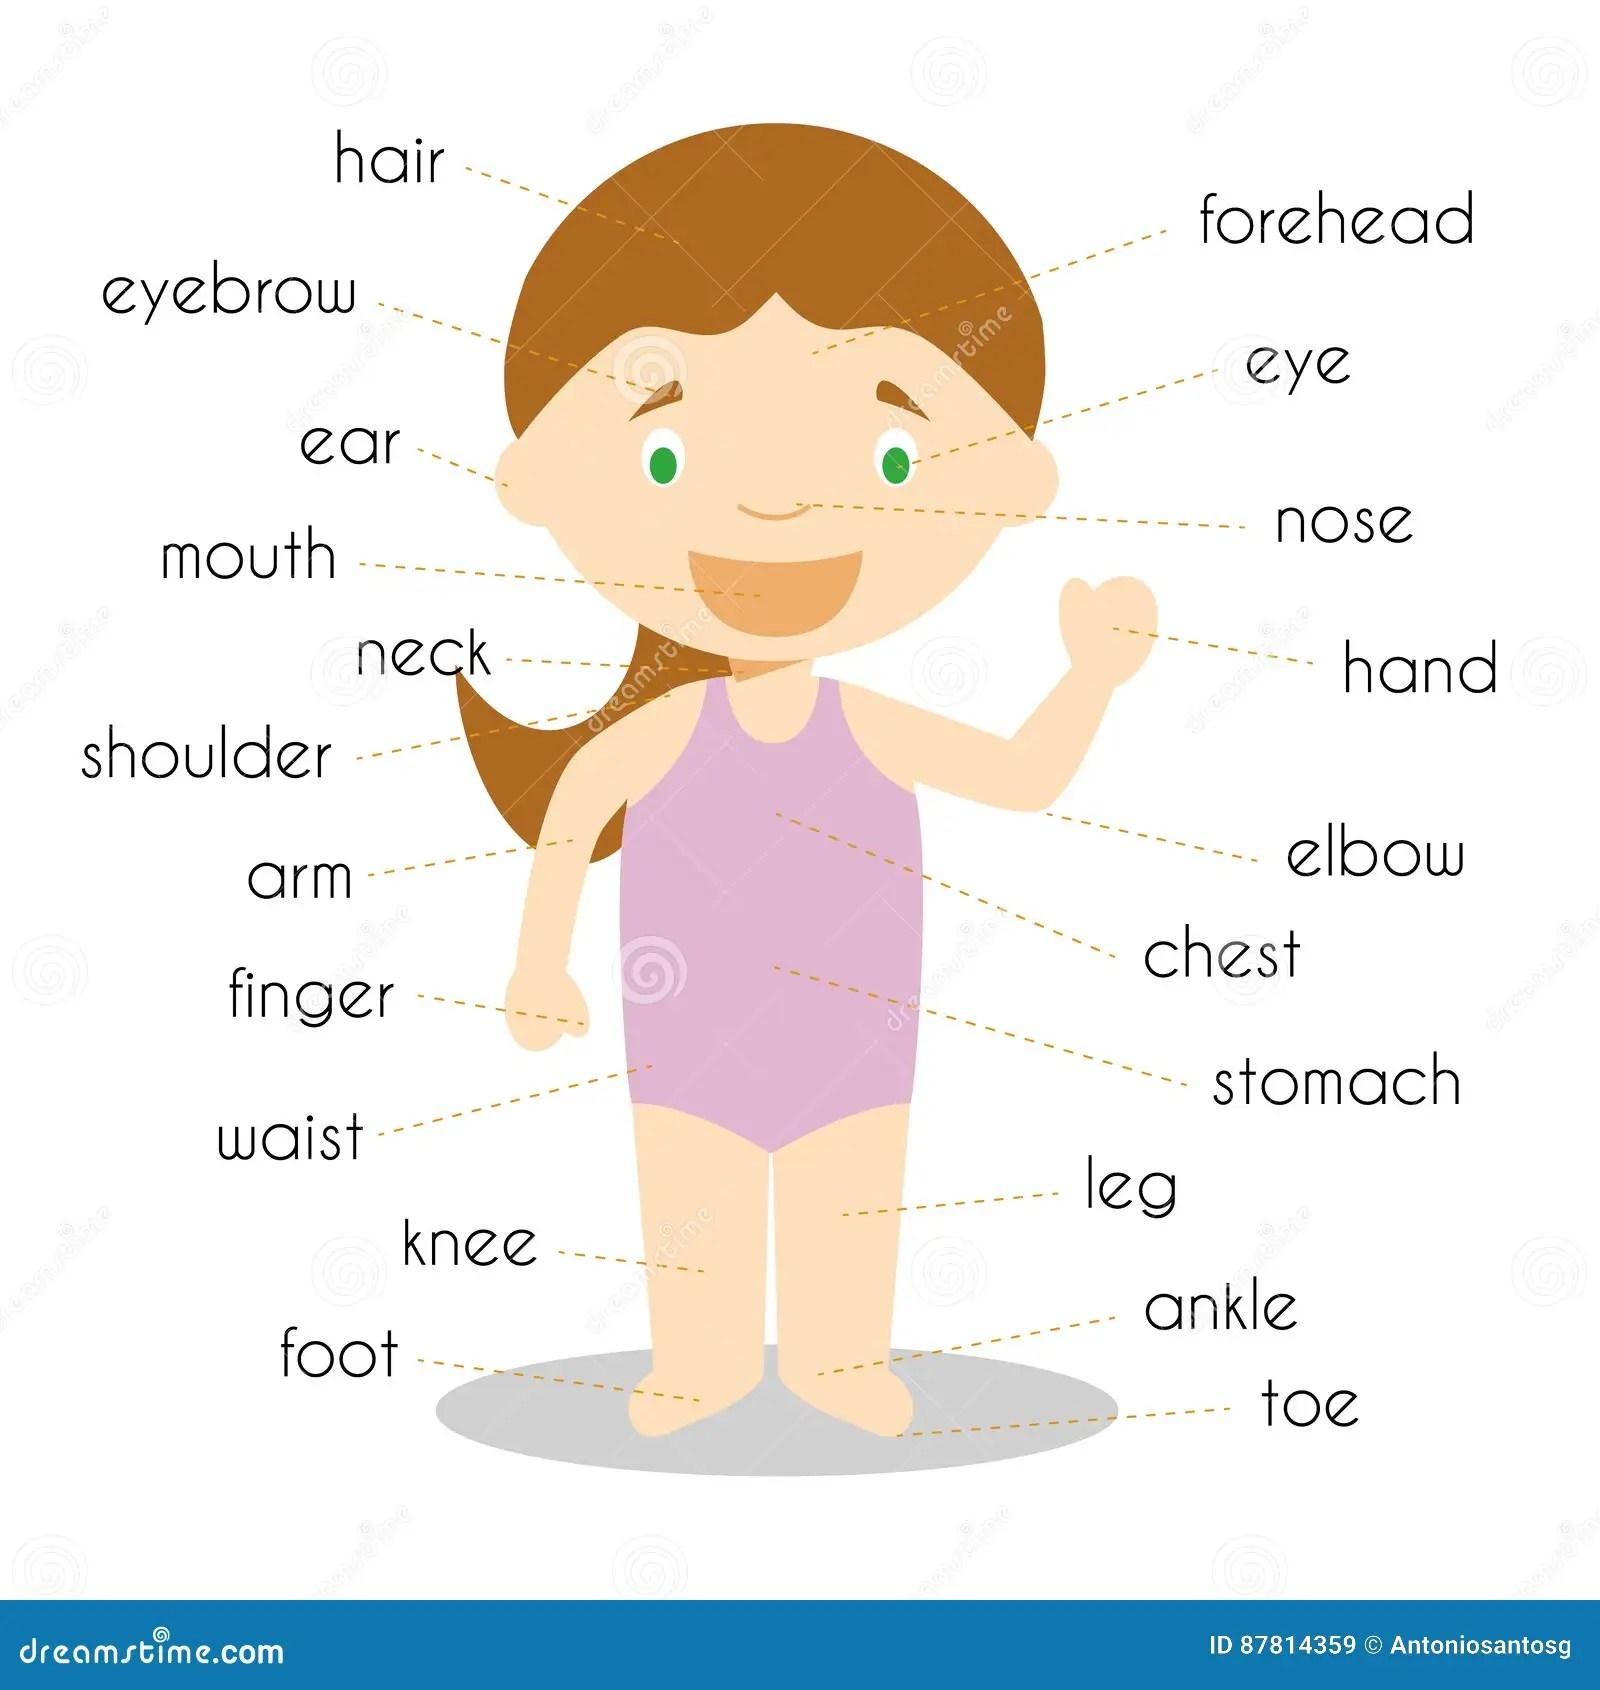 Human Body Parts Vocabulary In English Vector Illustration